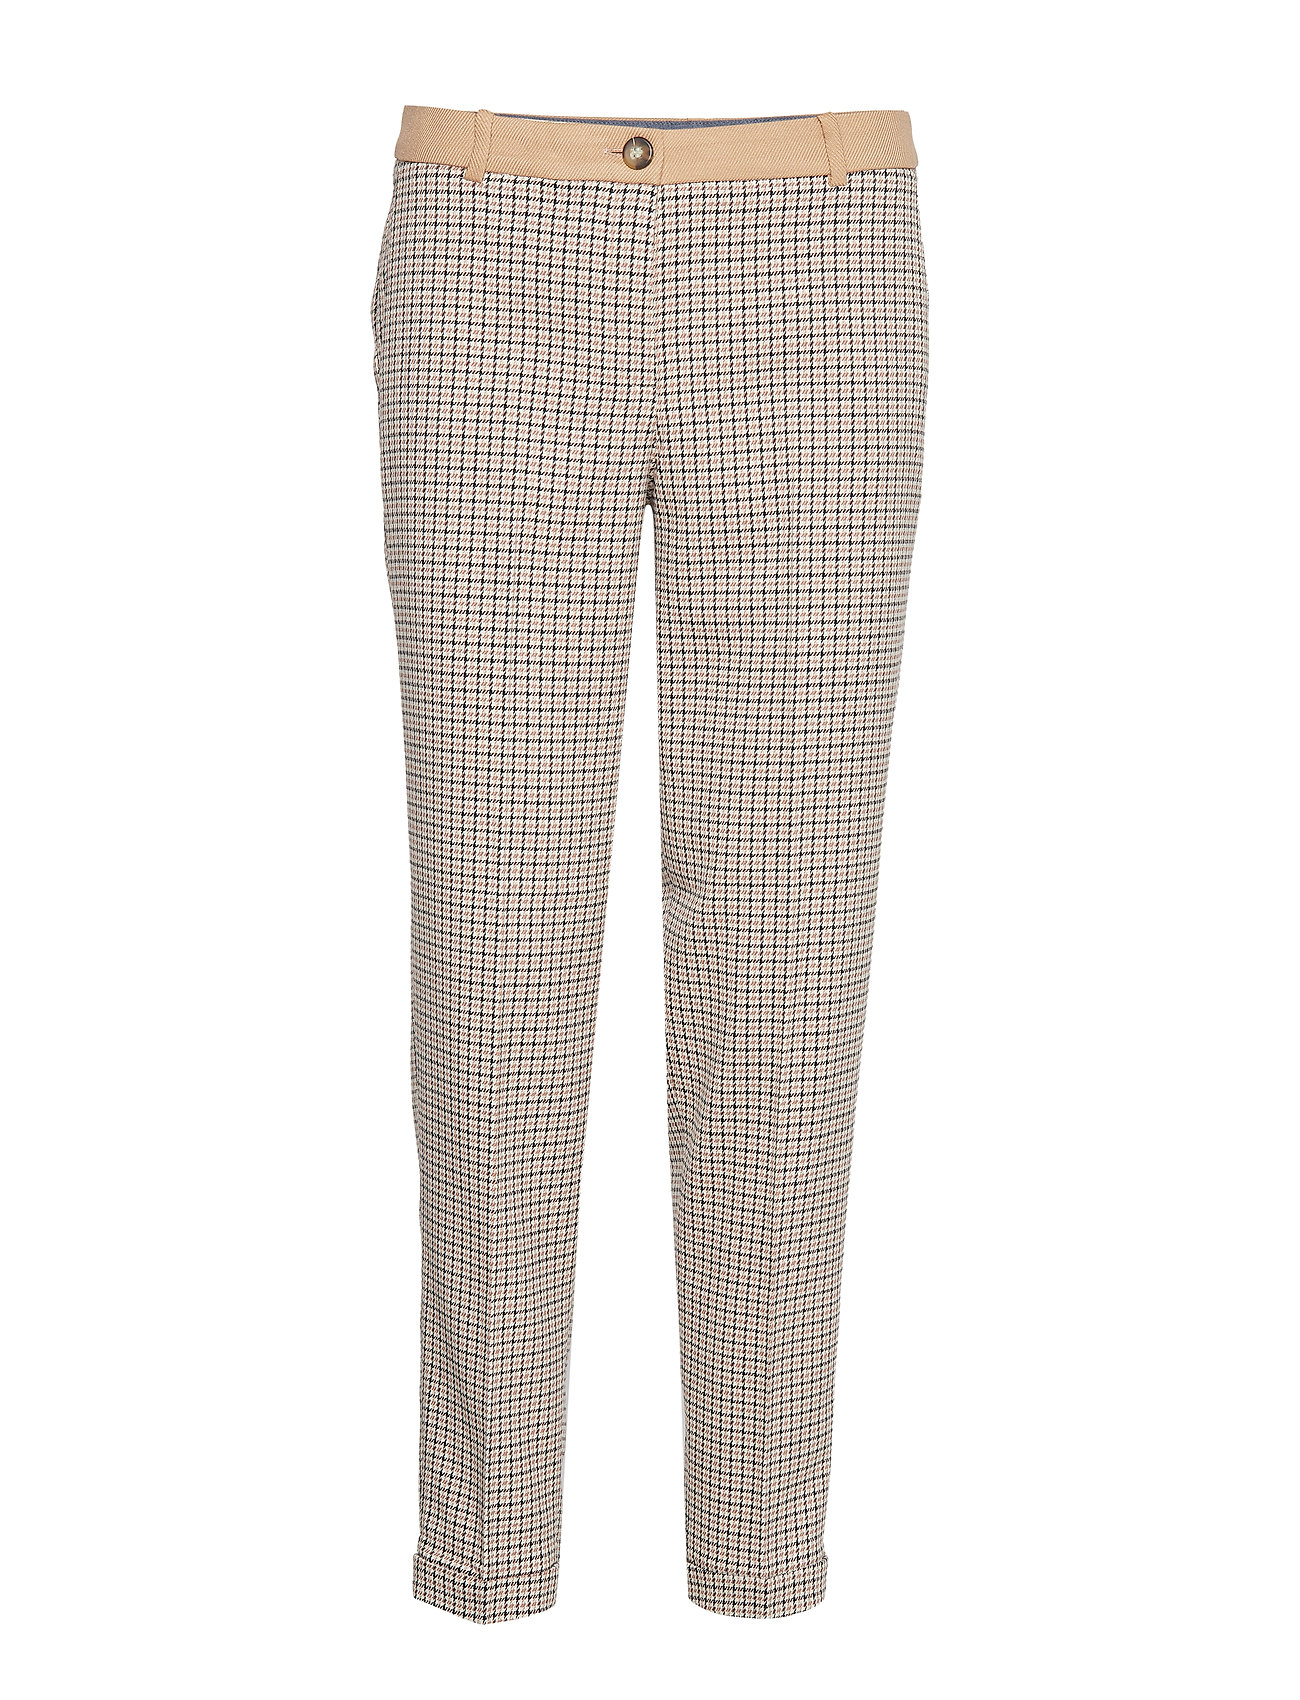 Esprit Casual Pants woven - CAMEL